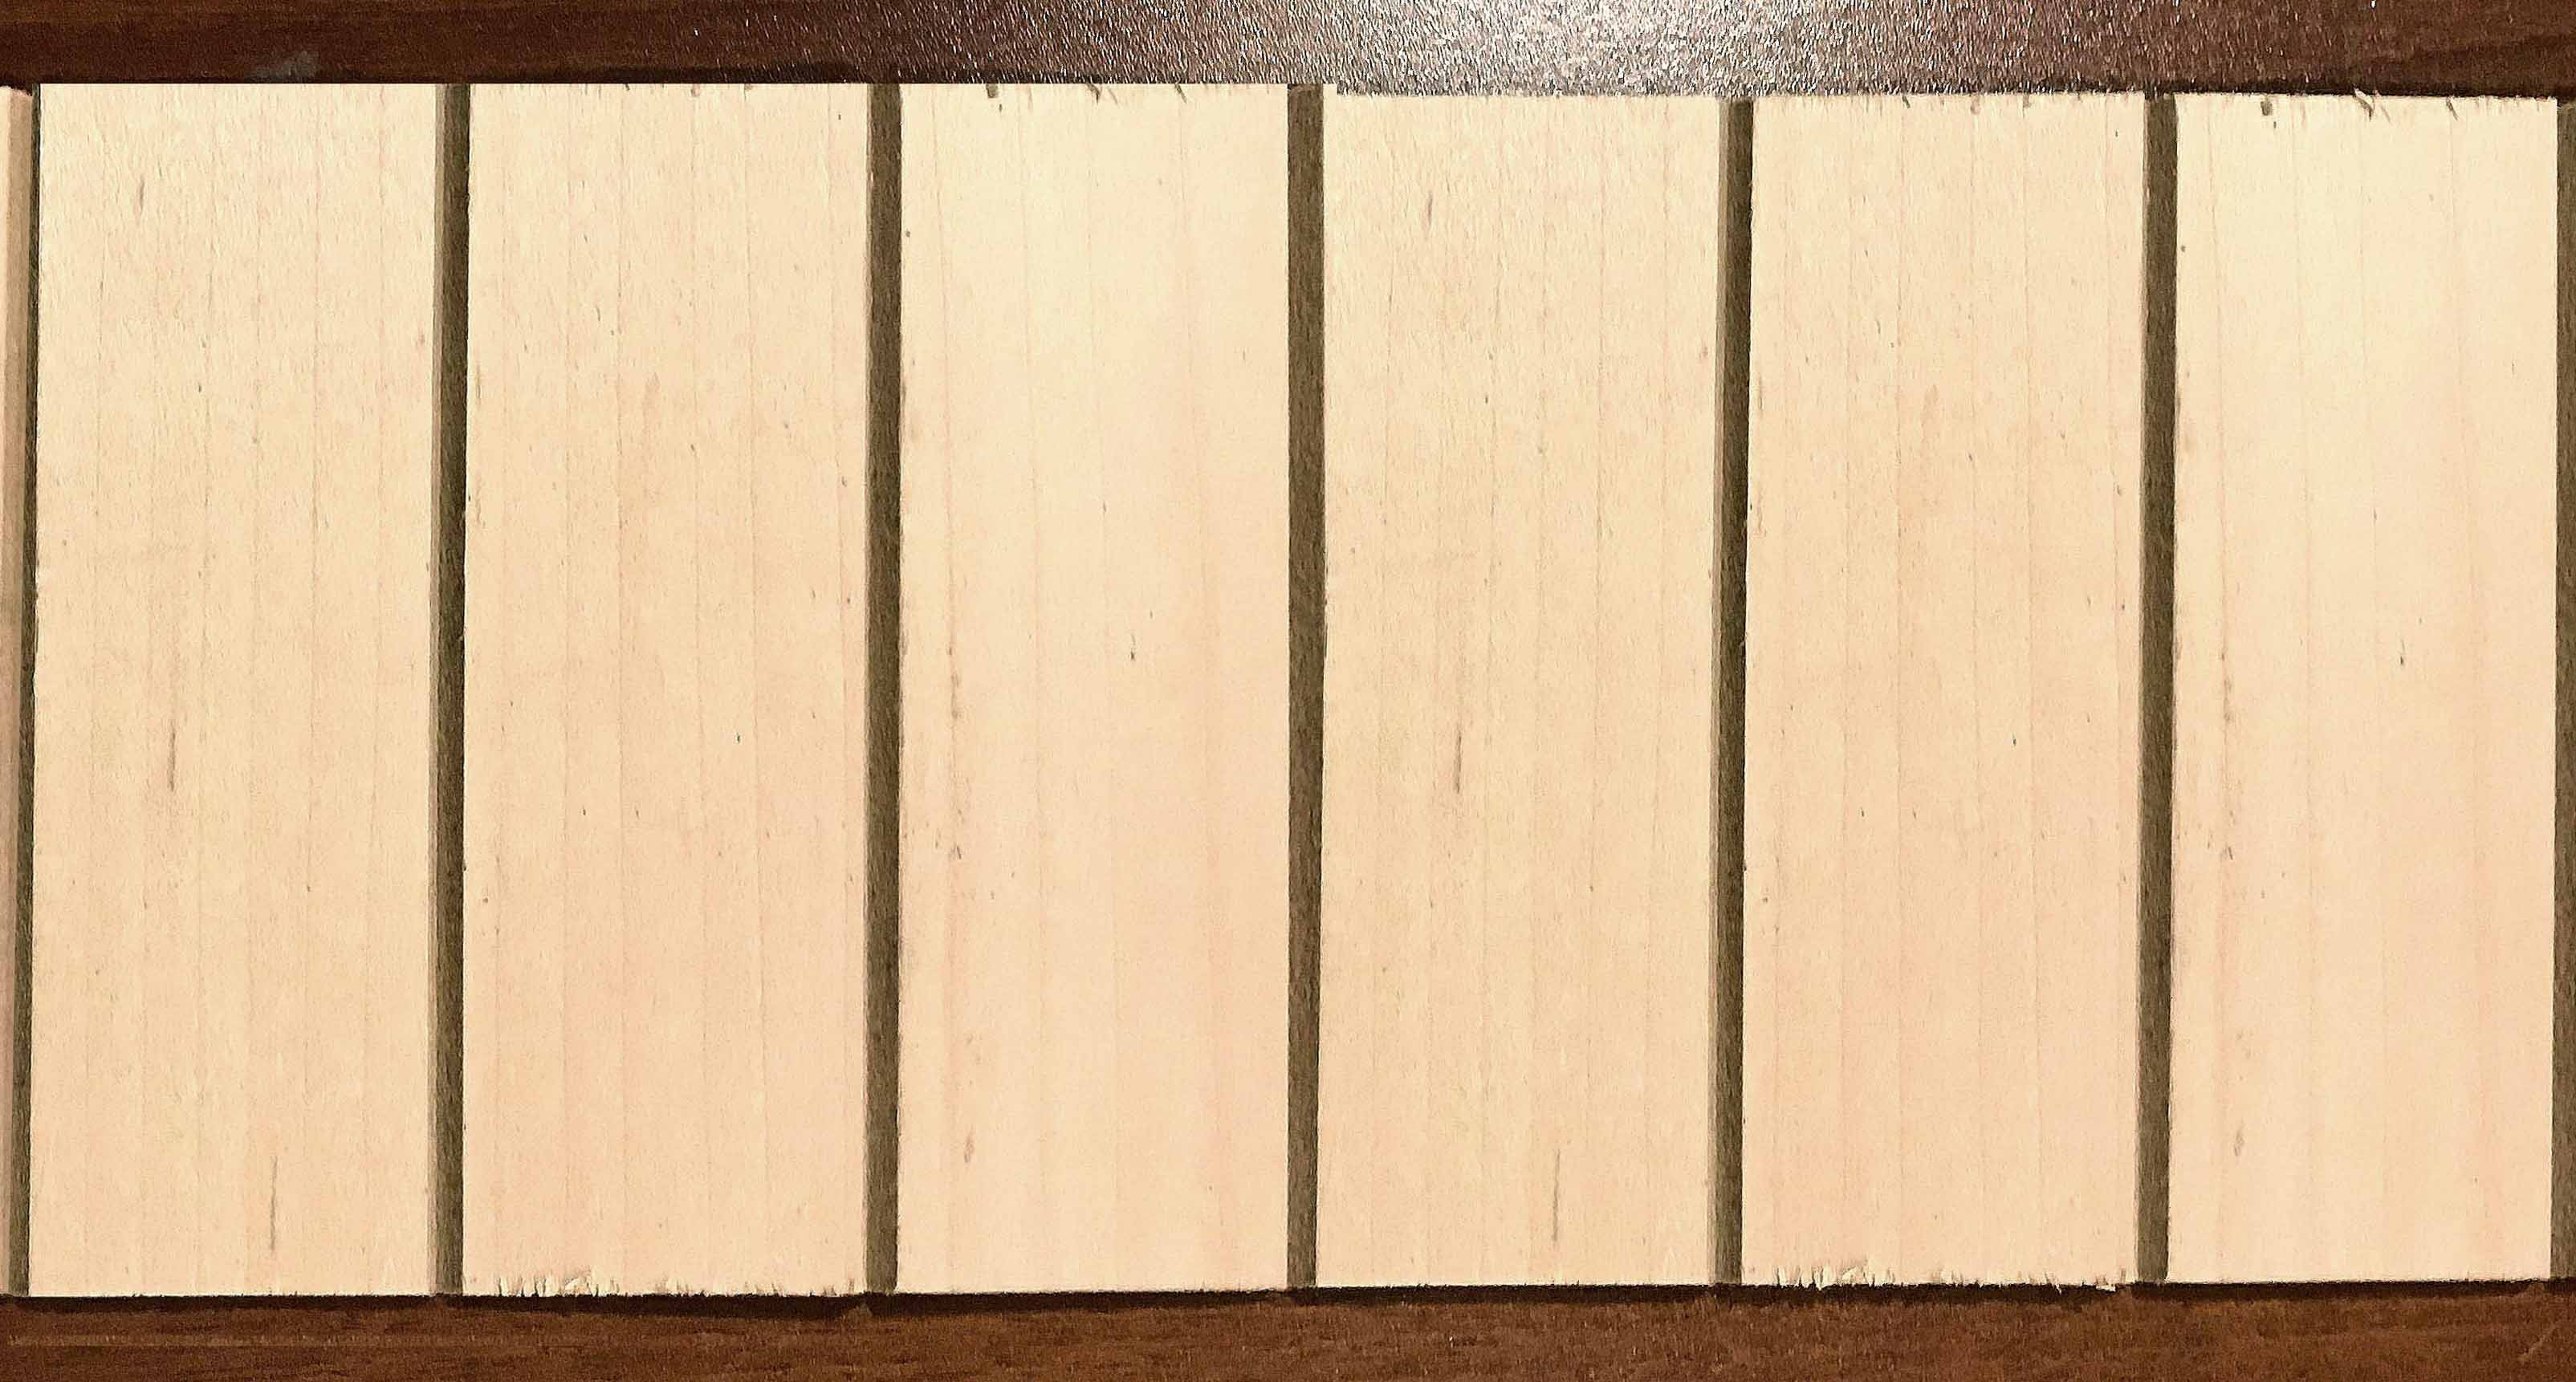 Tambour Panels • Solid wood and veneers • Surfacing Solution